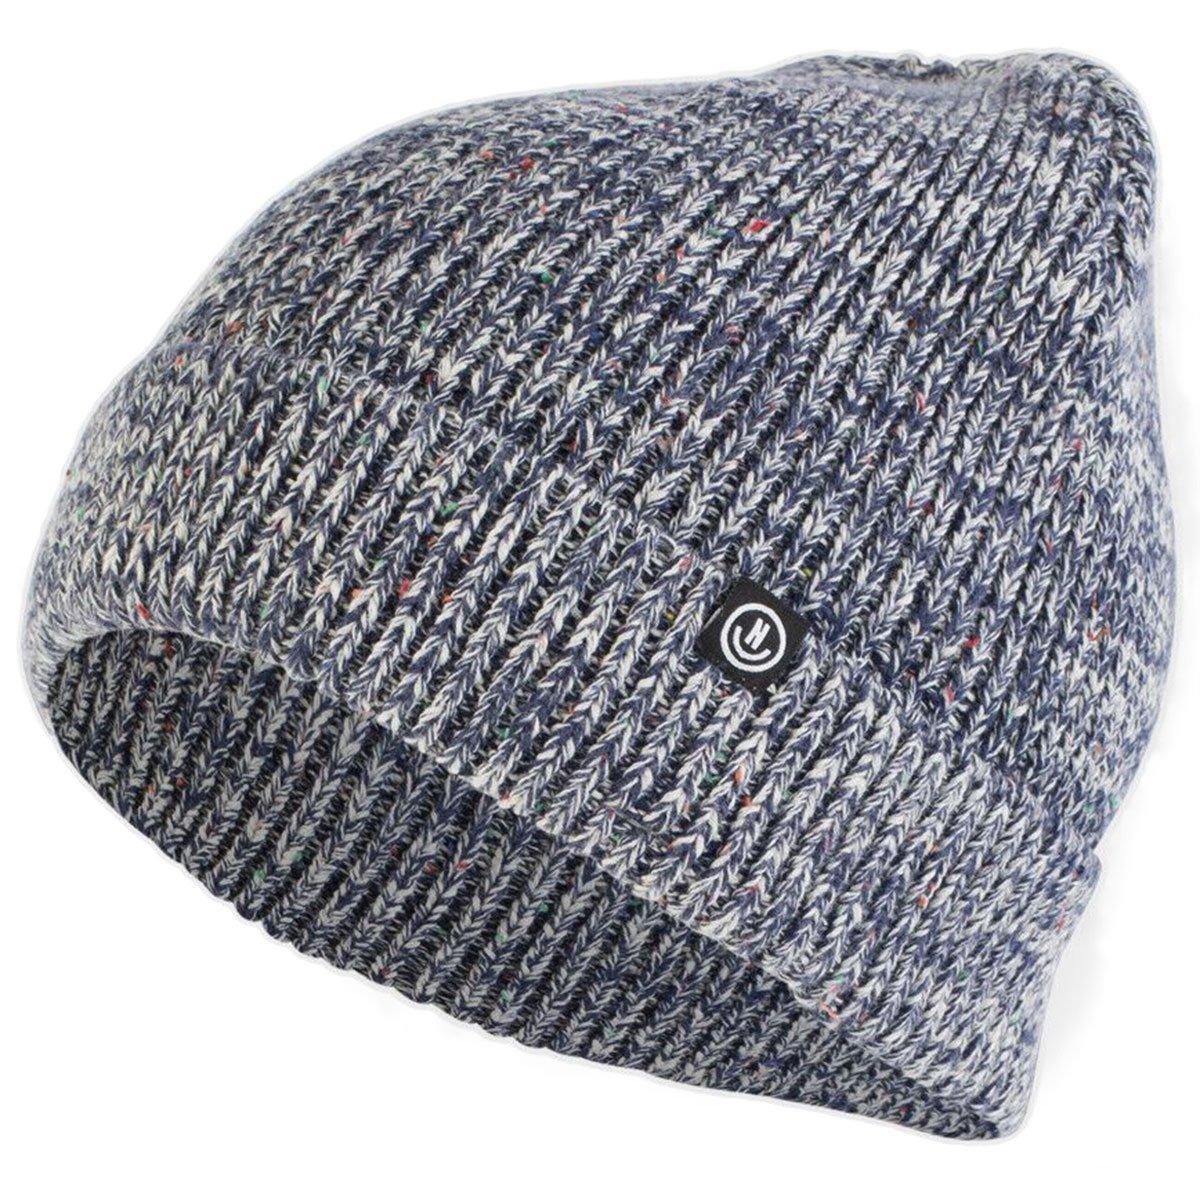 3ec1c8fbd06 Amazon.com  NEFF Unisex-Adult s Launder Beanie Fold Cuffed Warm Winter Hat